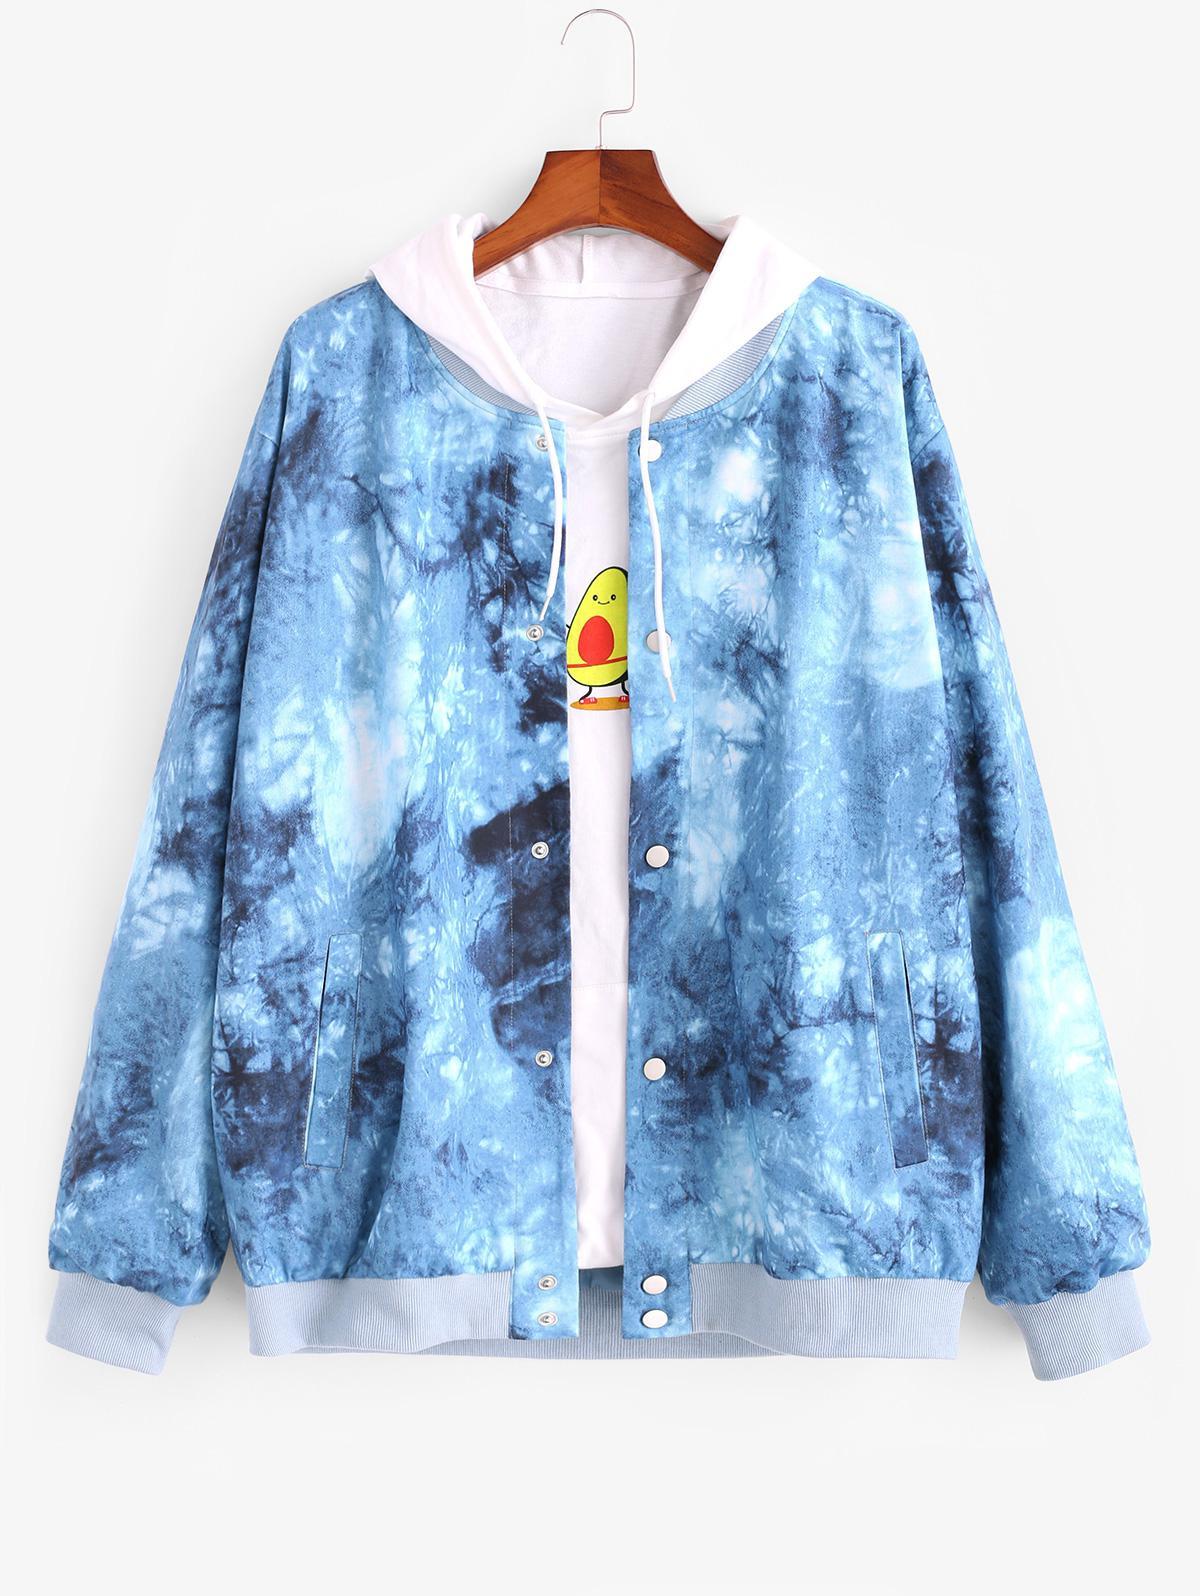 Zaful Tie Dye Print Jacket